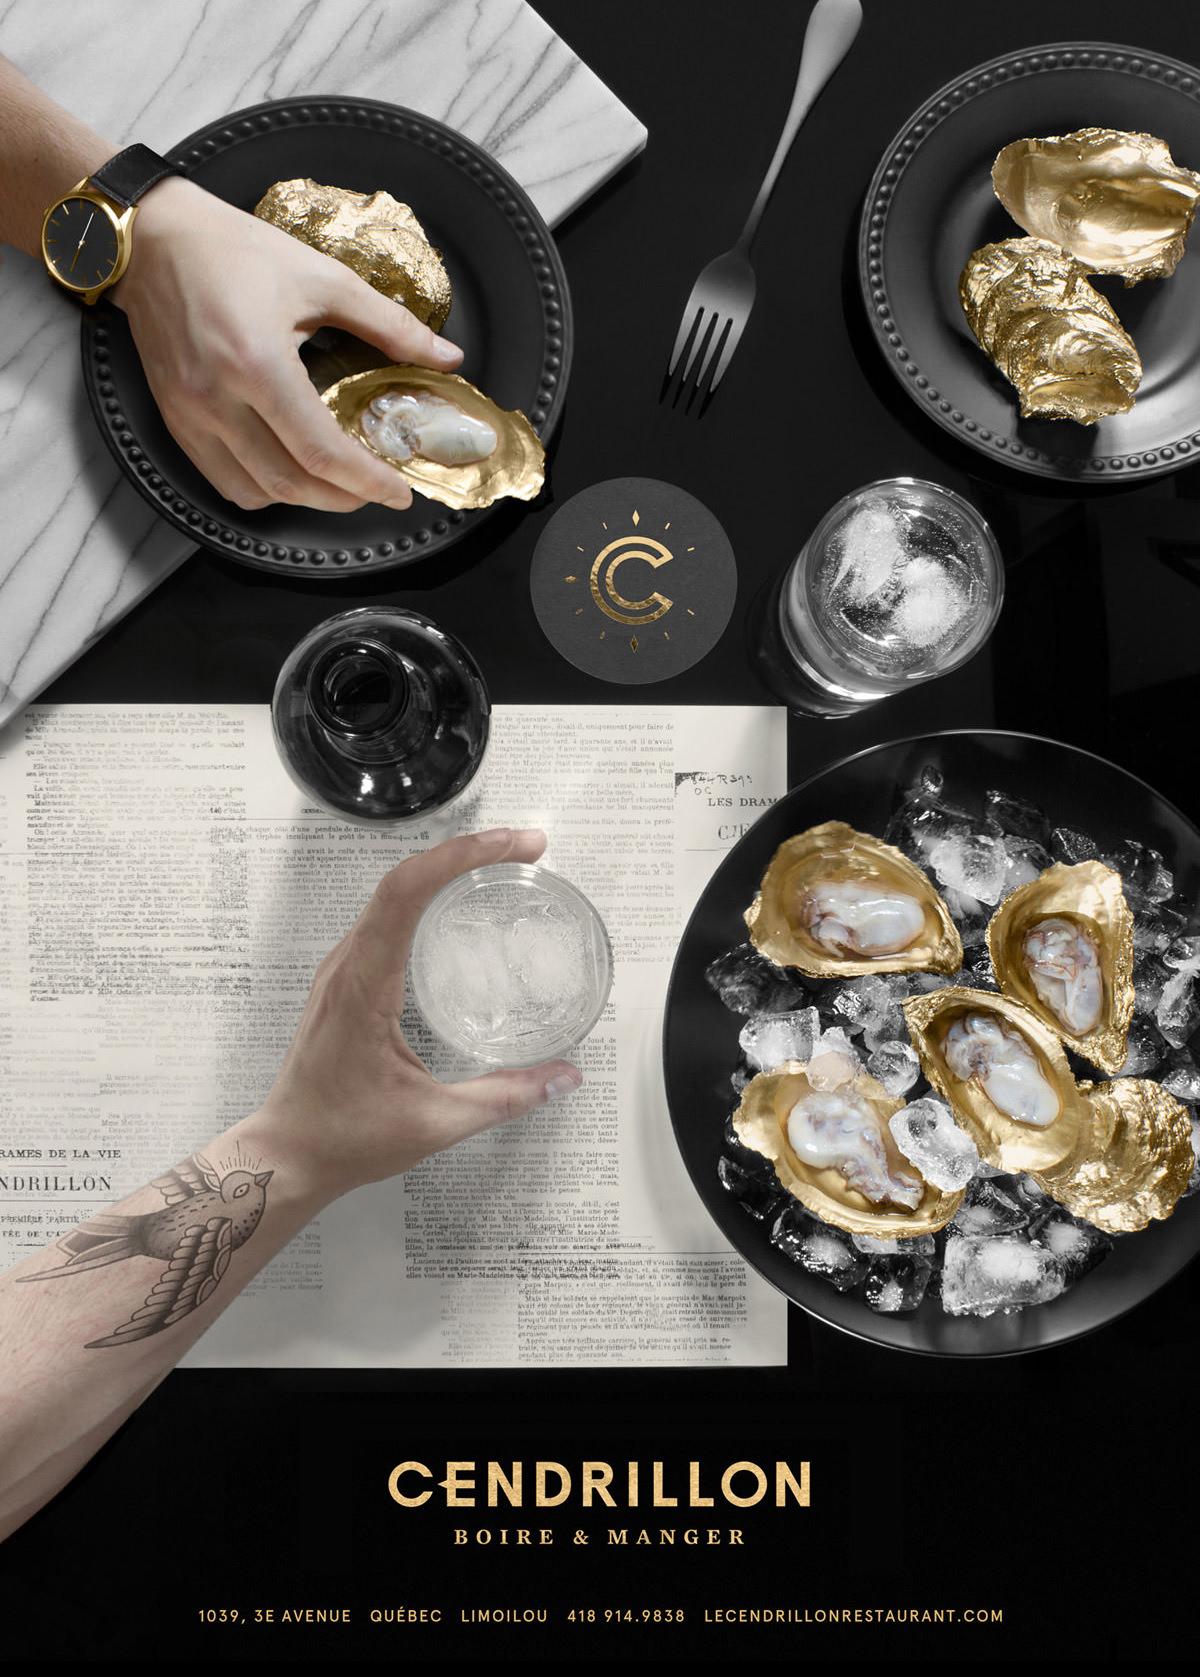 Figure-Jeremy-Hall-Design-Graphique-Logo-Branding-Image-De-Marque-Cendrillon-Restaurant-Publicite-11.jpg